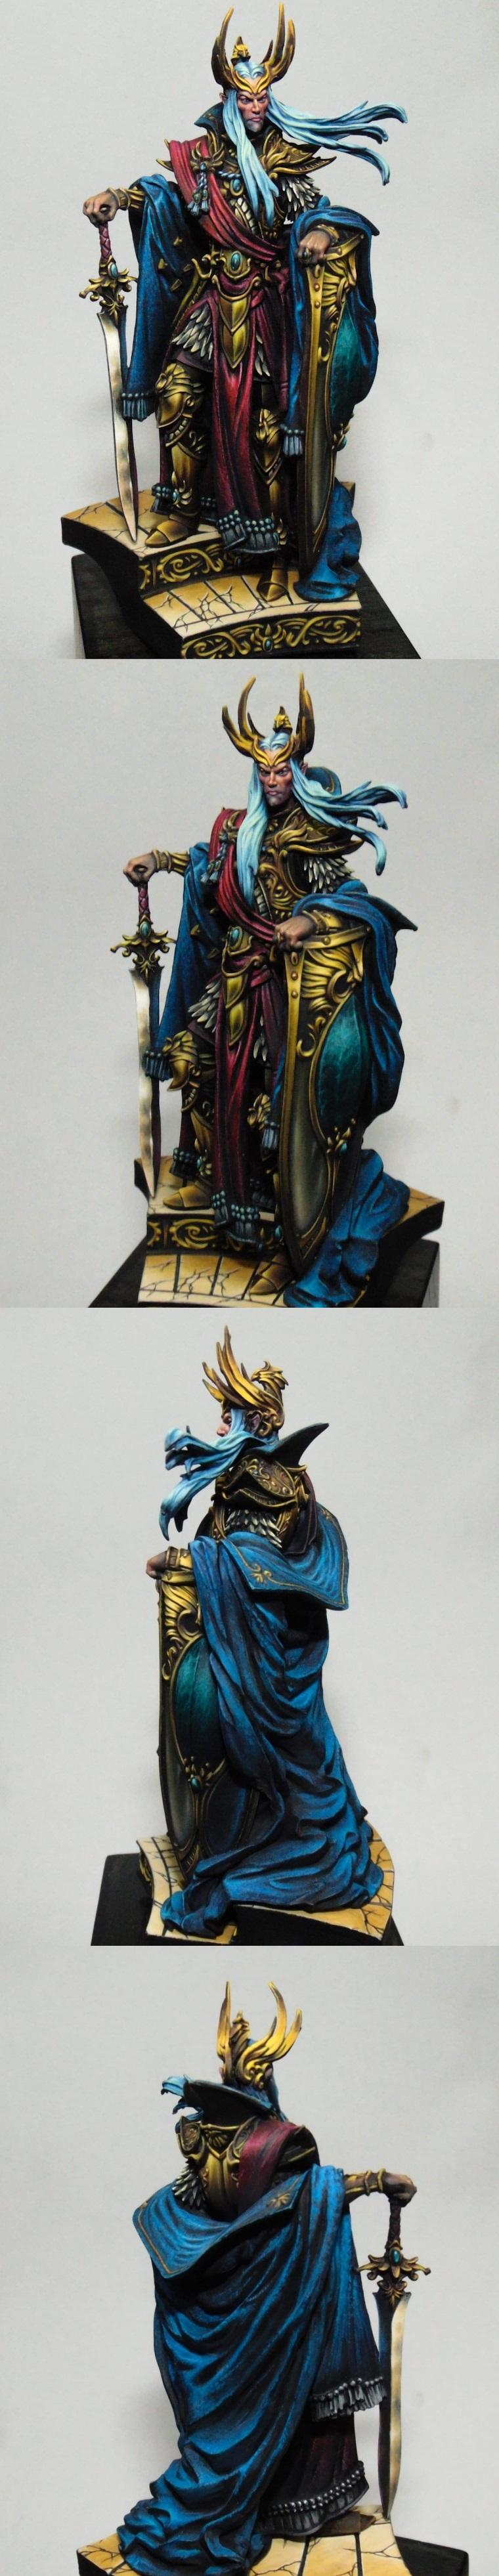 ETERNAL, HIGH ELF KING- GURA RESIN KITS